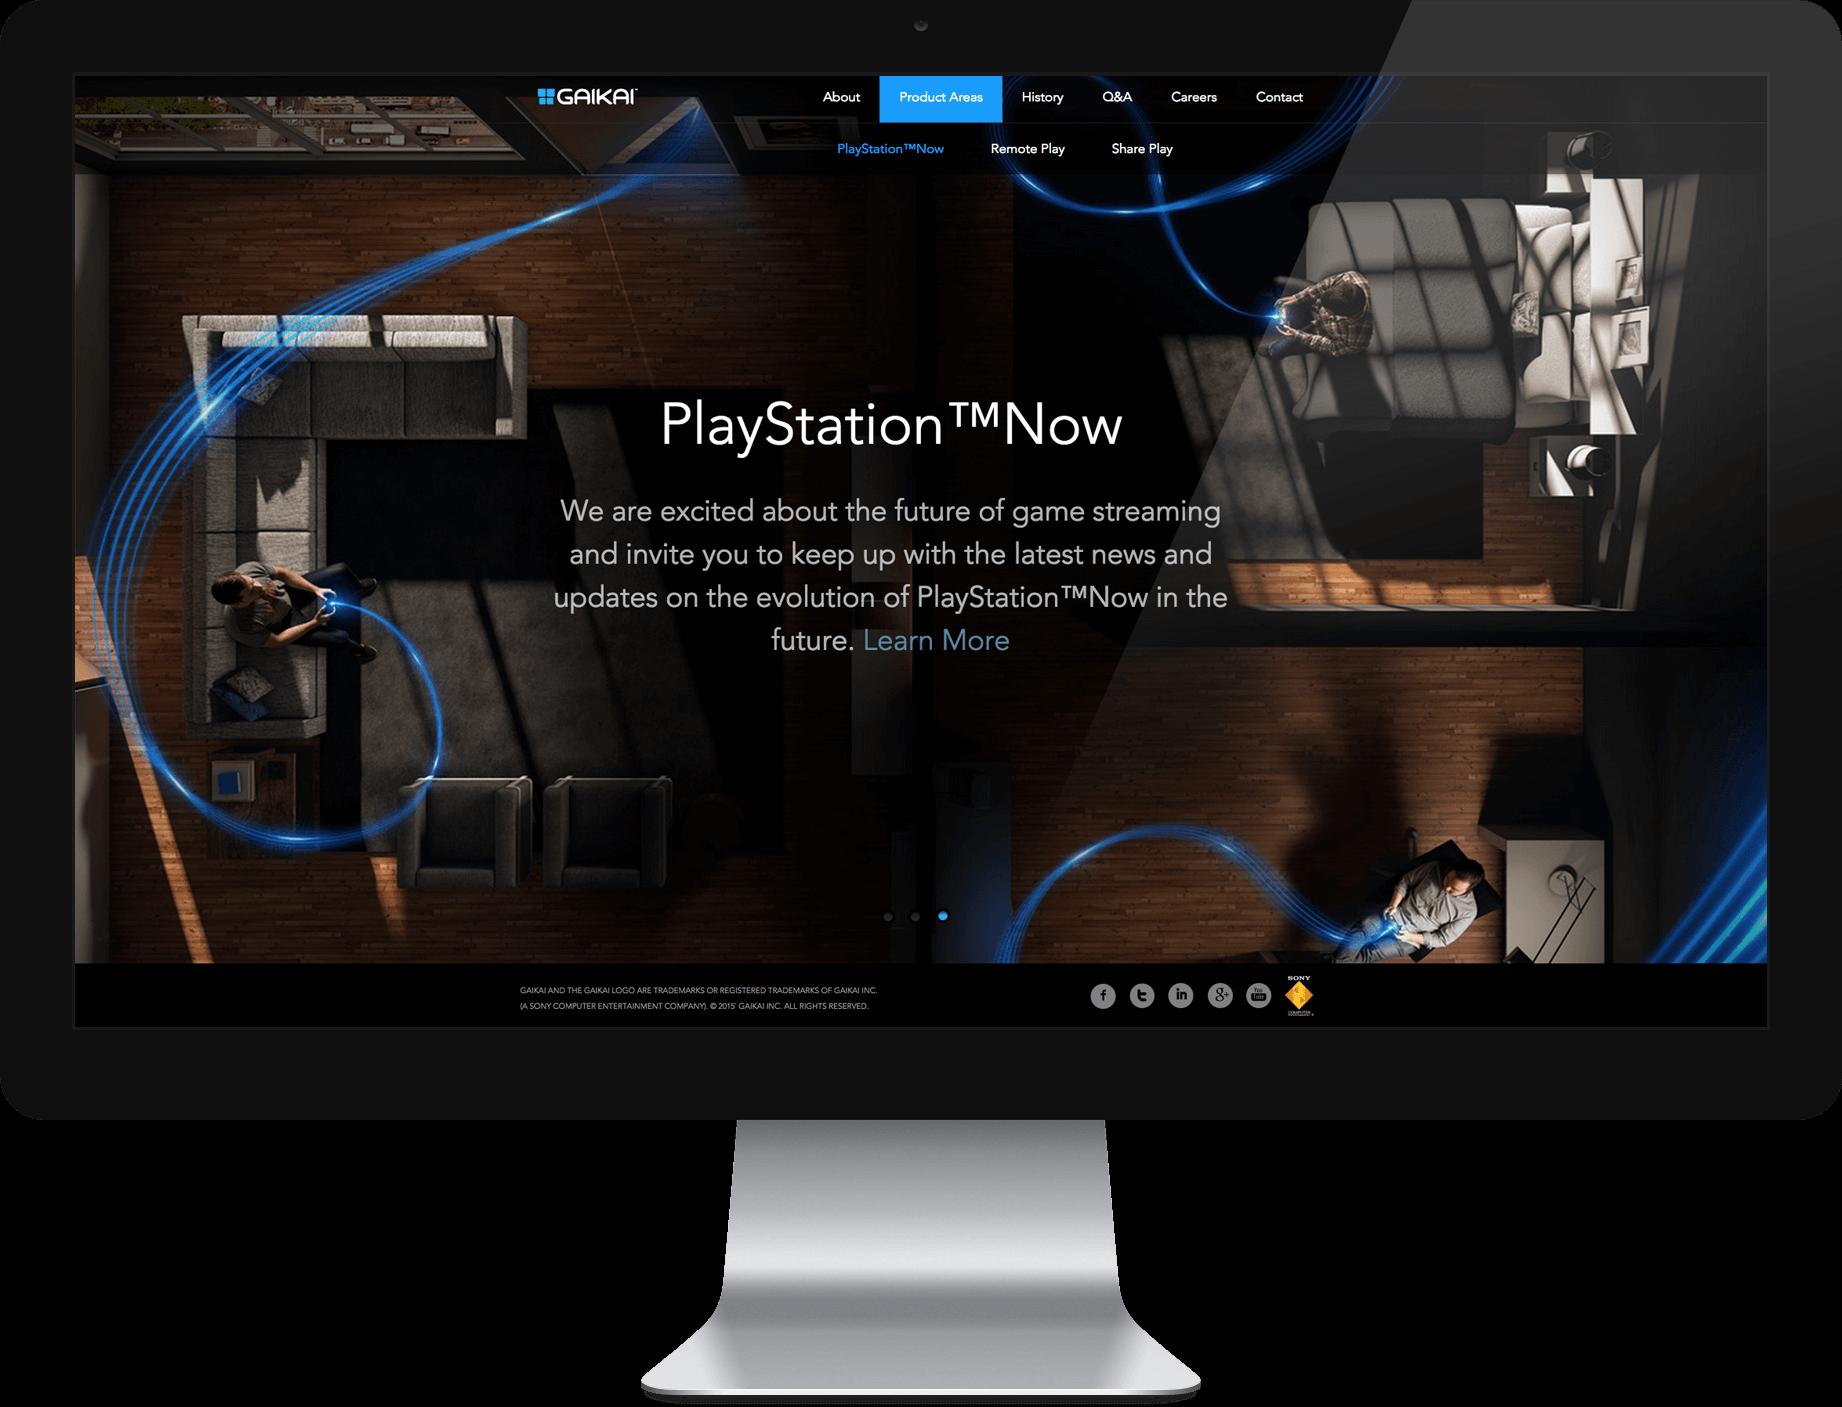 GK_Website_Computer_2.png